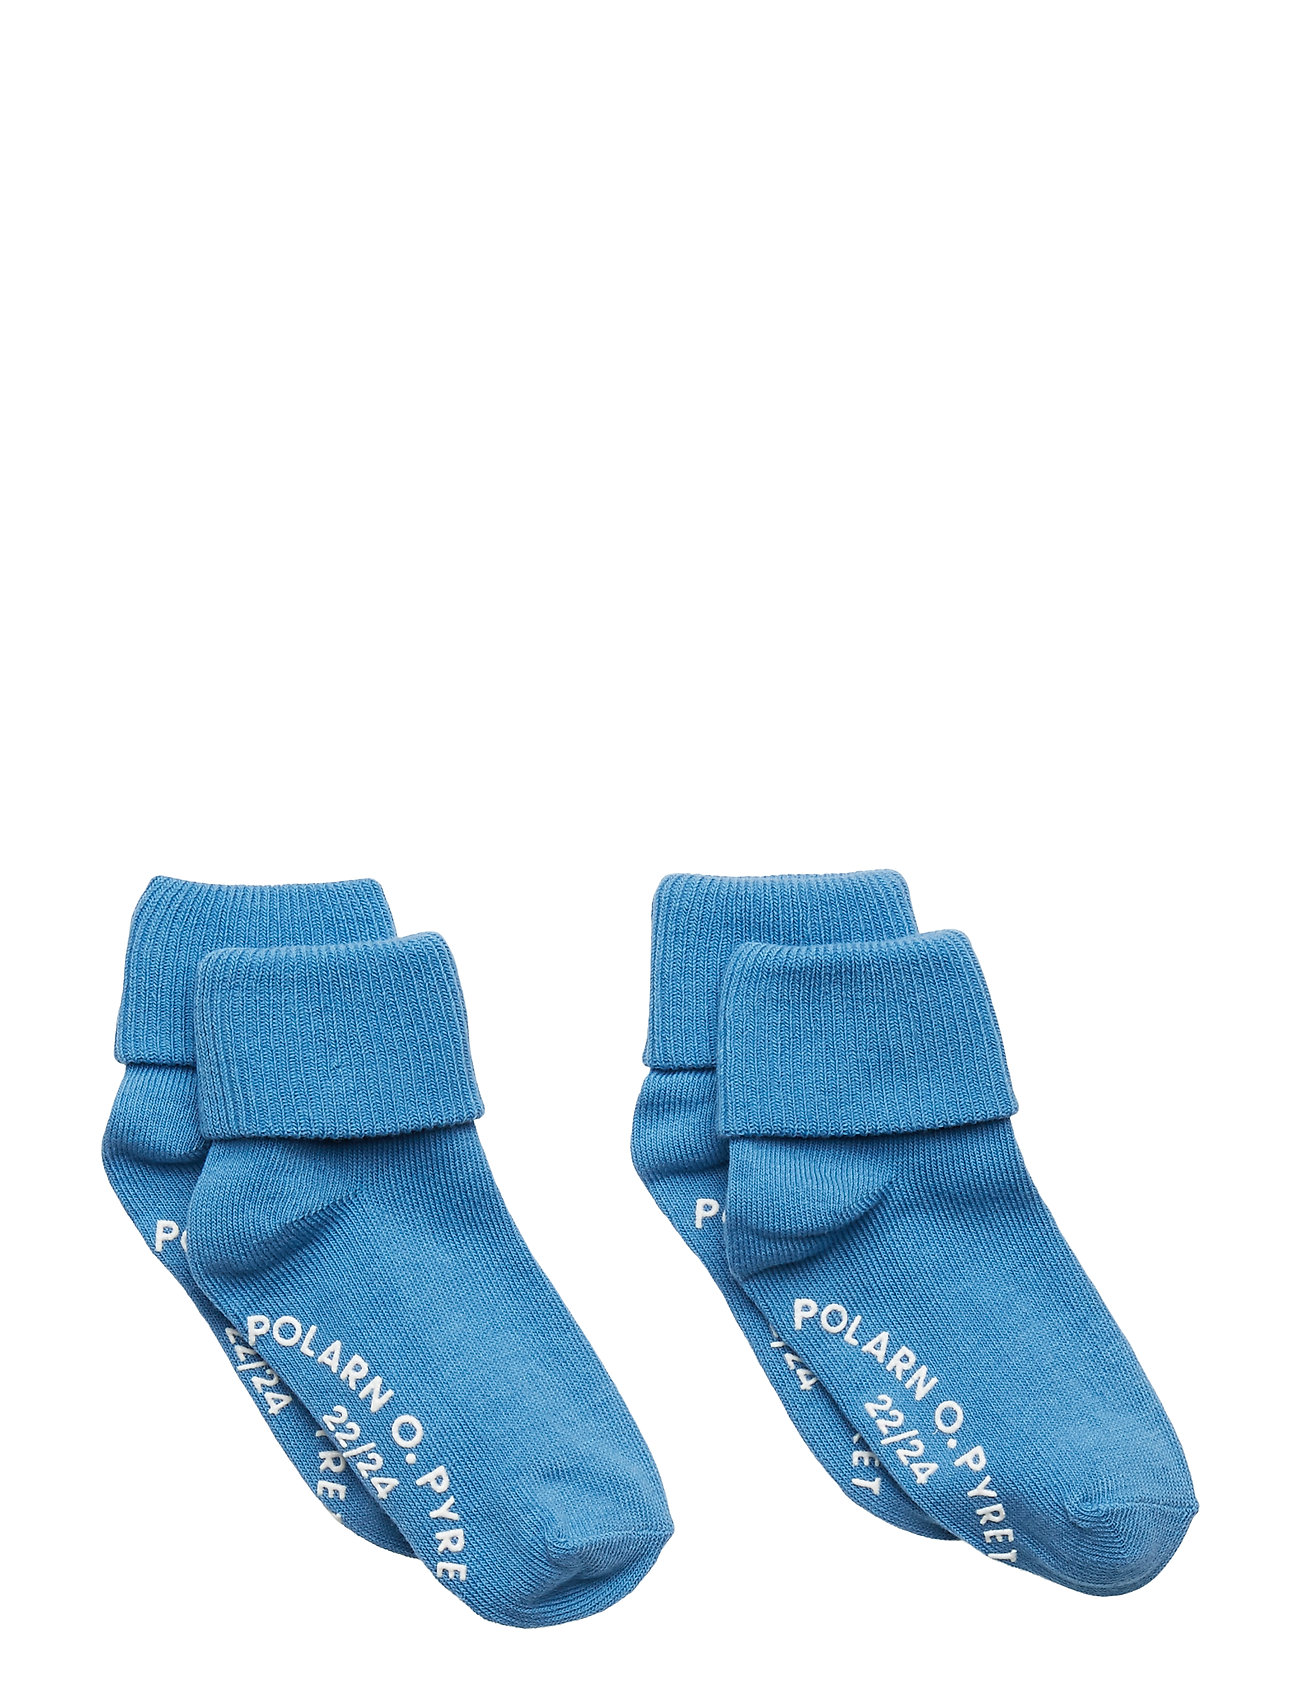 Polarn O. Pyret Socks 2-Pack Solid Preschool - PARISIAN BLUE